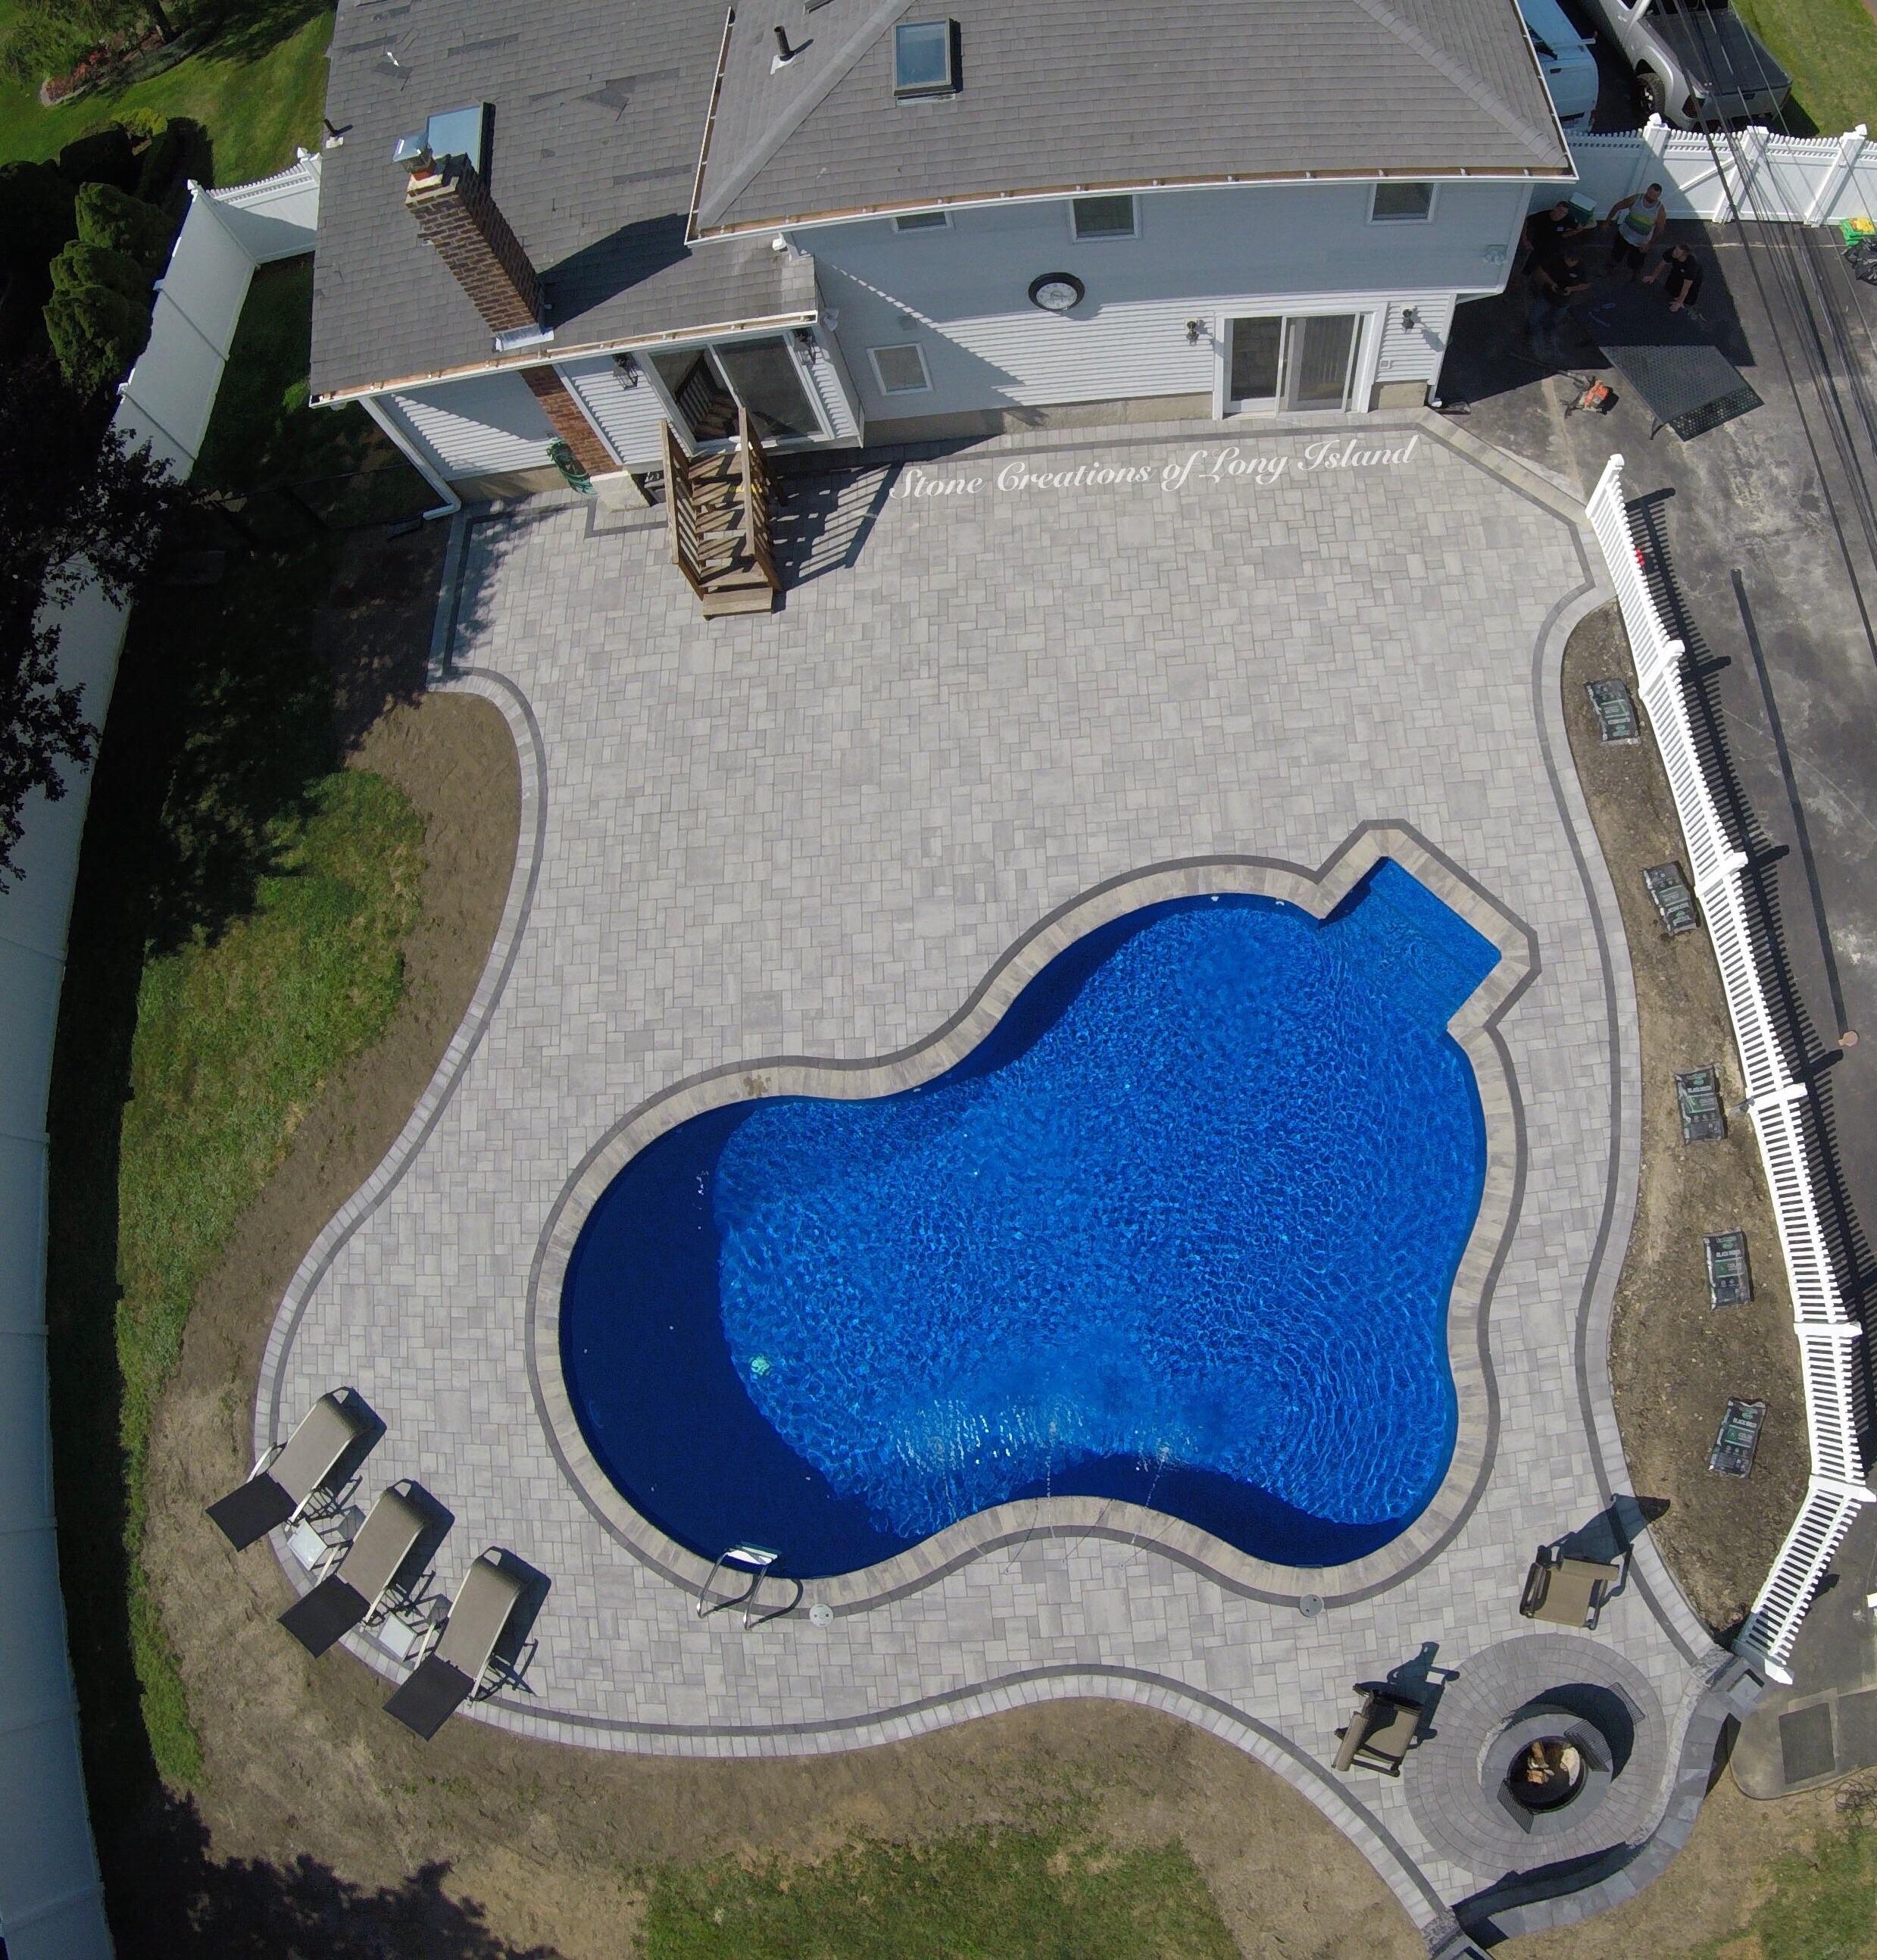 Cambridge Paver Pool Patio - East Islip, NY 11730